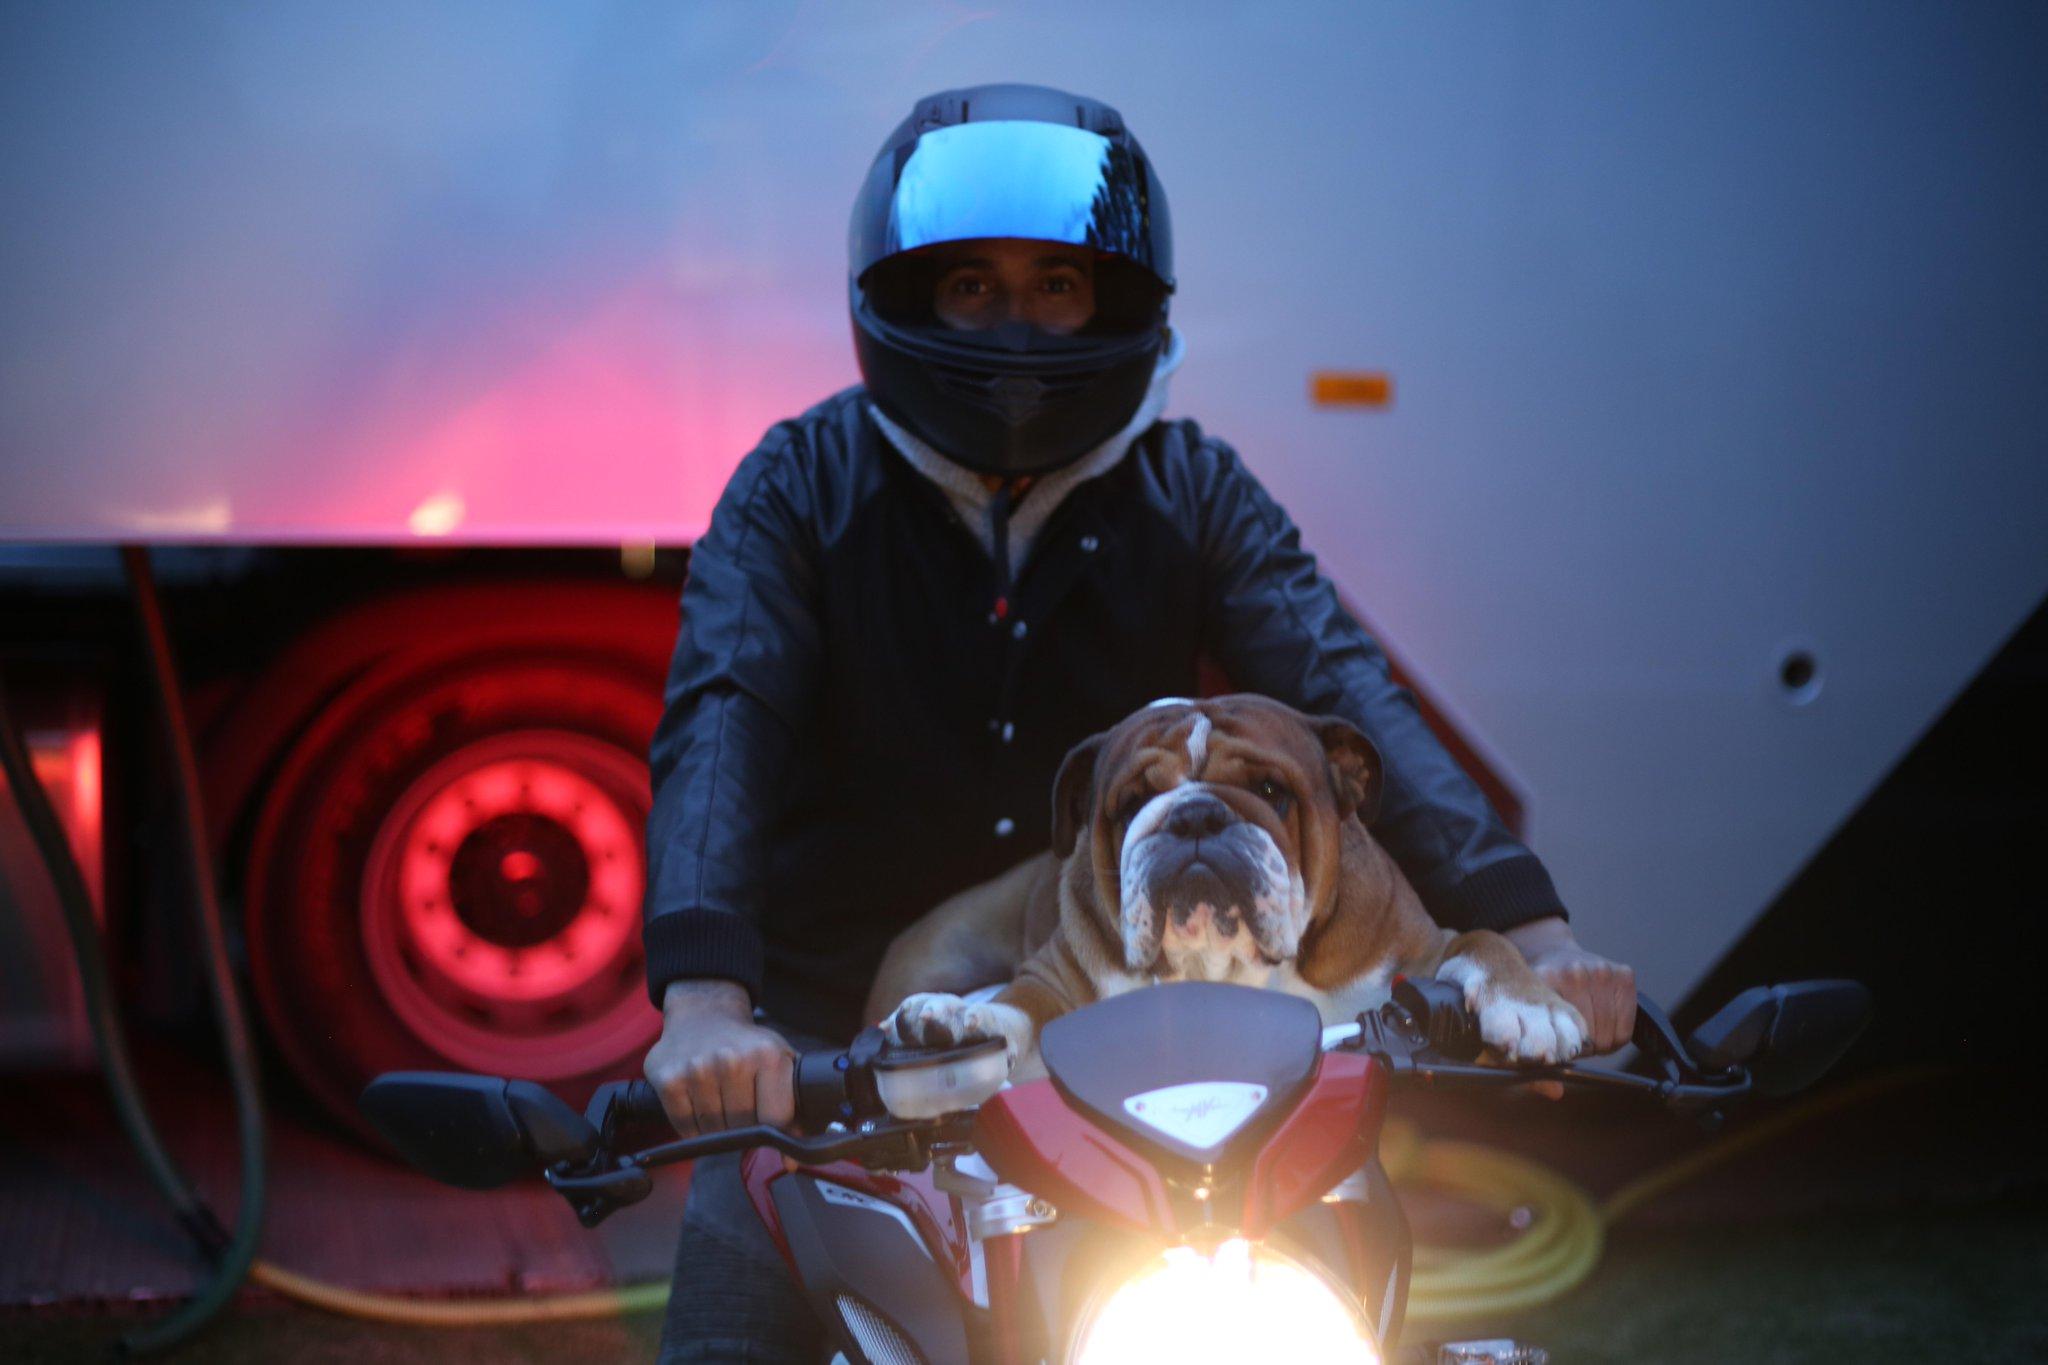 Roscoe Knievel and I going for a ride!! 😂😂😂 #BestDogs #bestbuddy #englishbulldog #RoscoeHam http://t.co/nWZ9YU0AjC